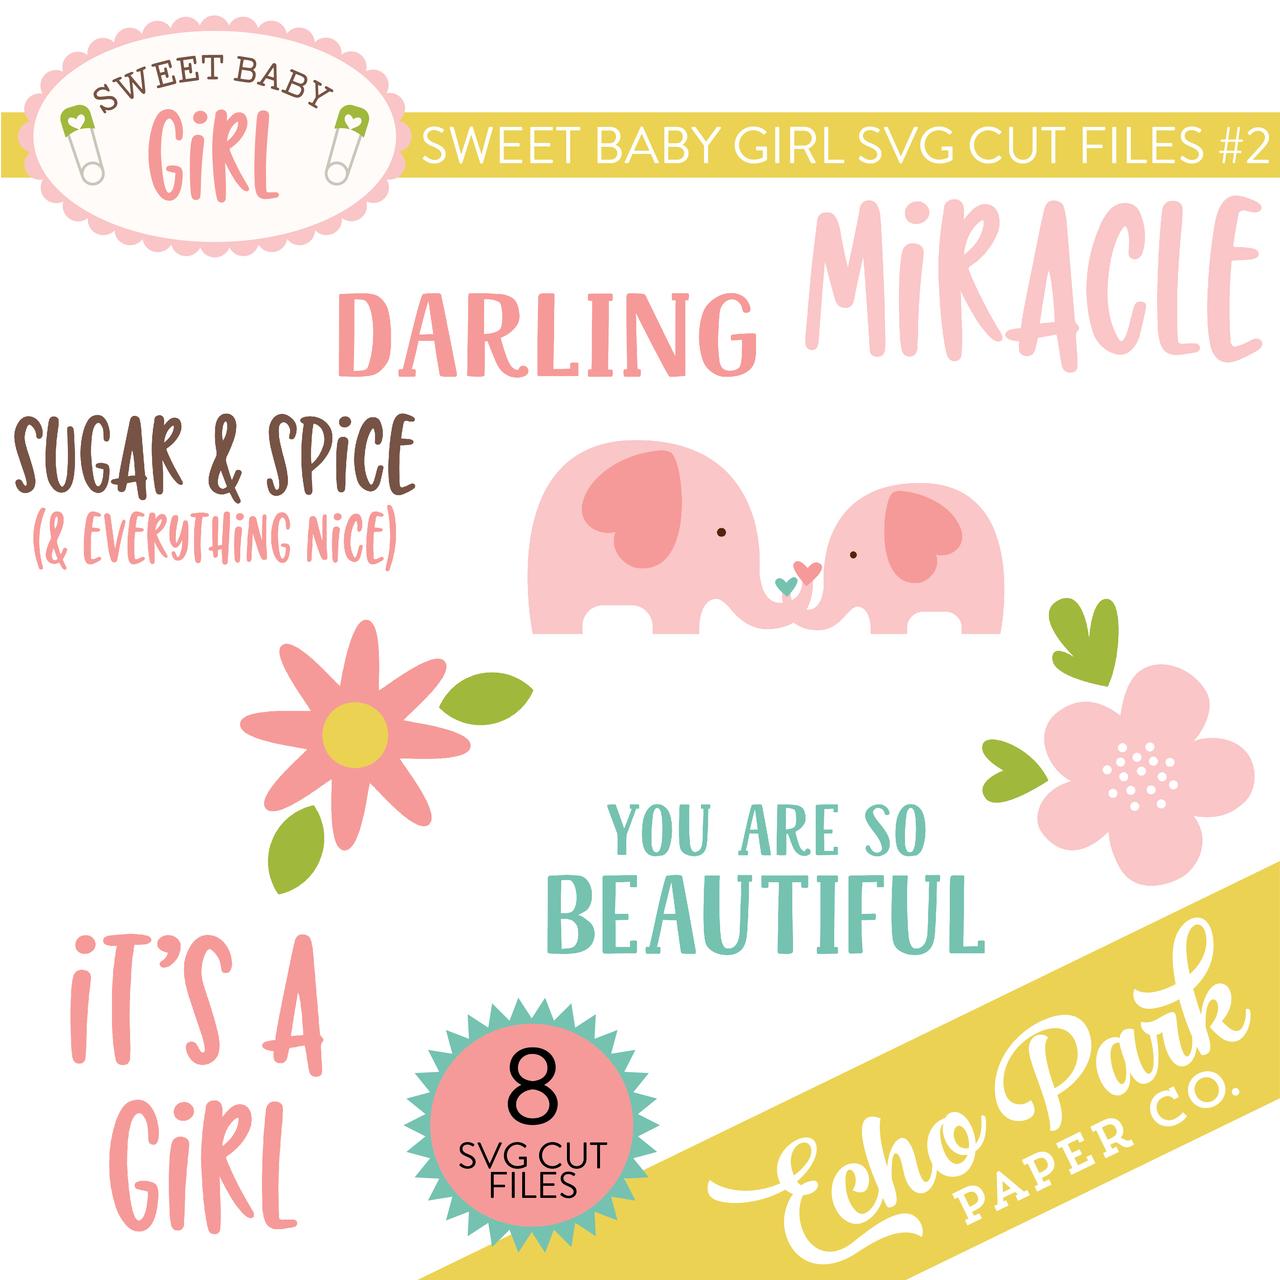 Sweet Baby Girl SVG Cut Files #2